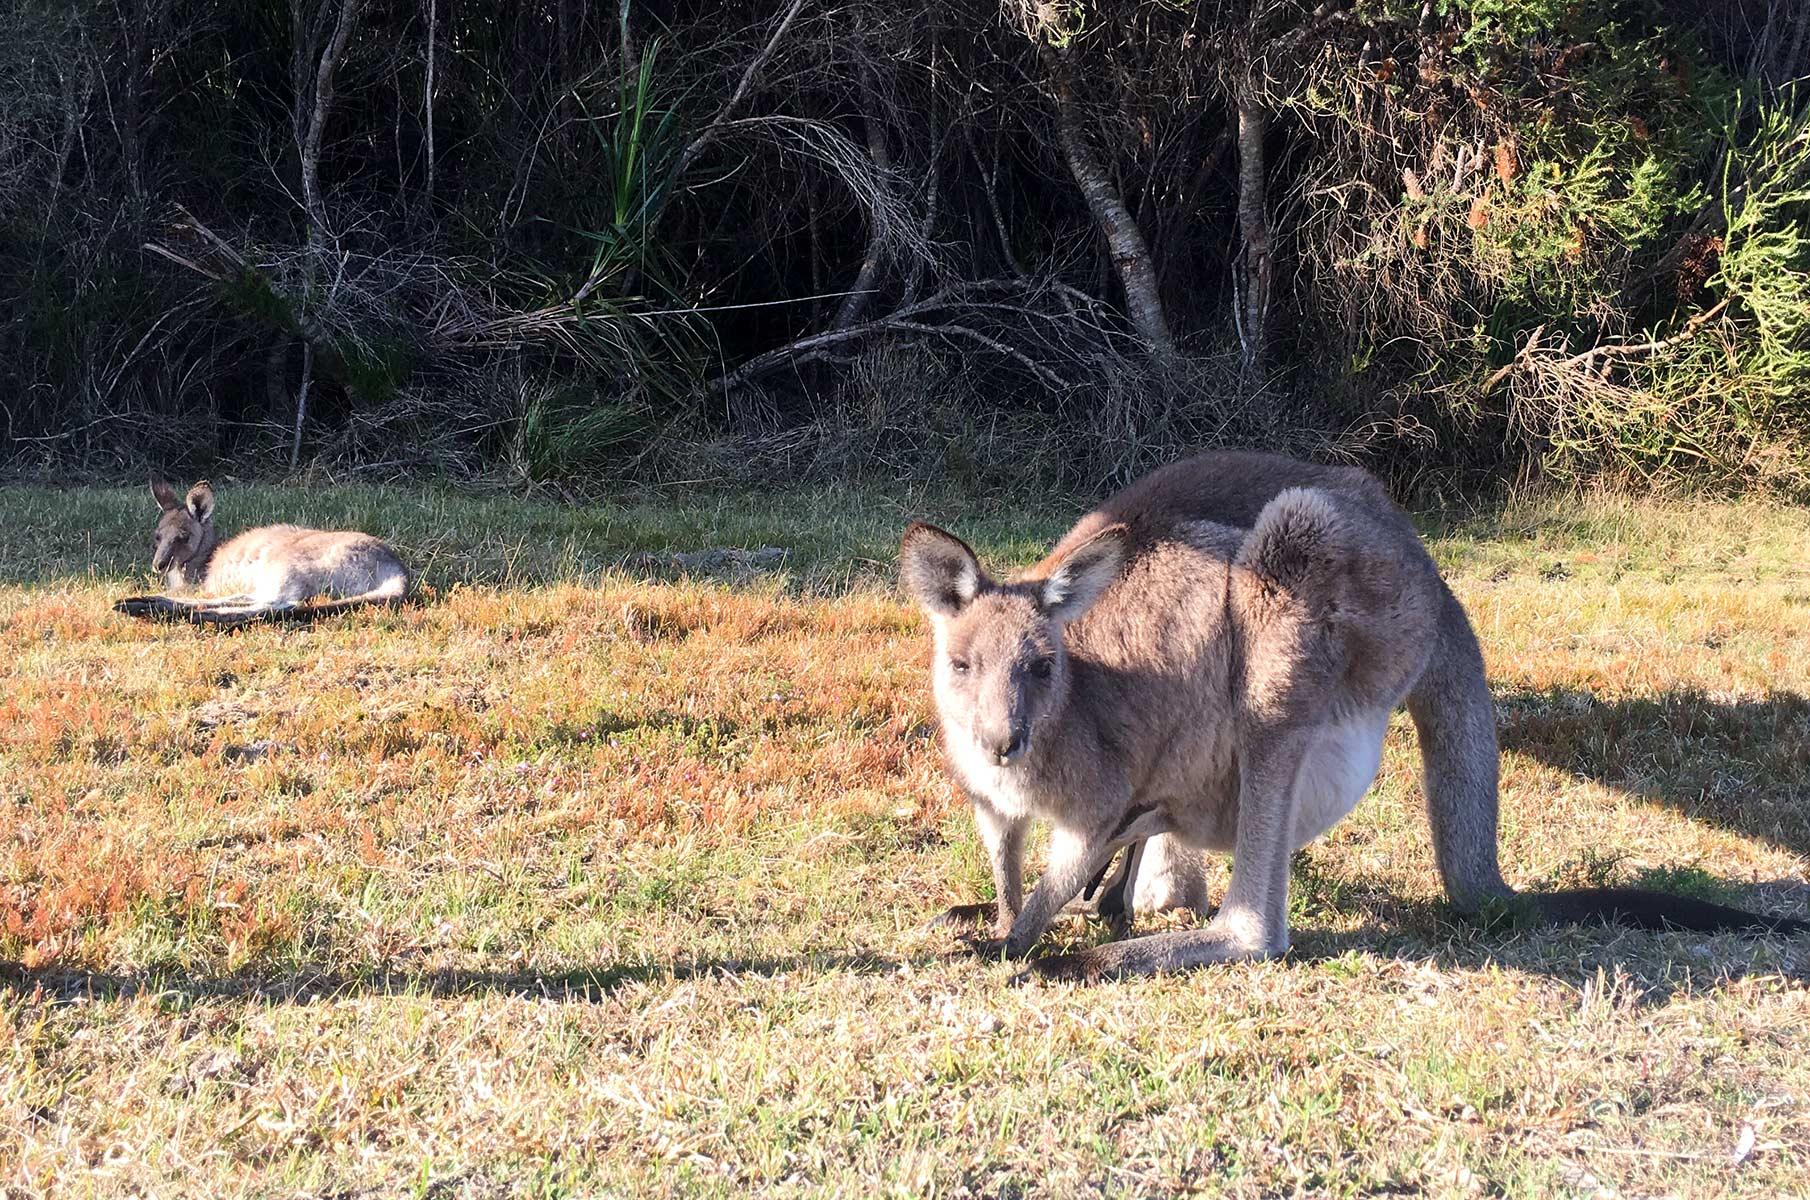 Wildes Känguru in Australien nahe Jervis Bay